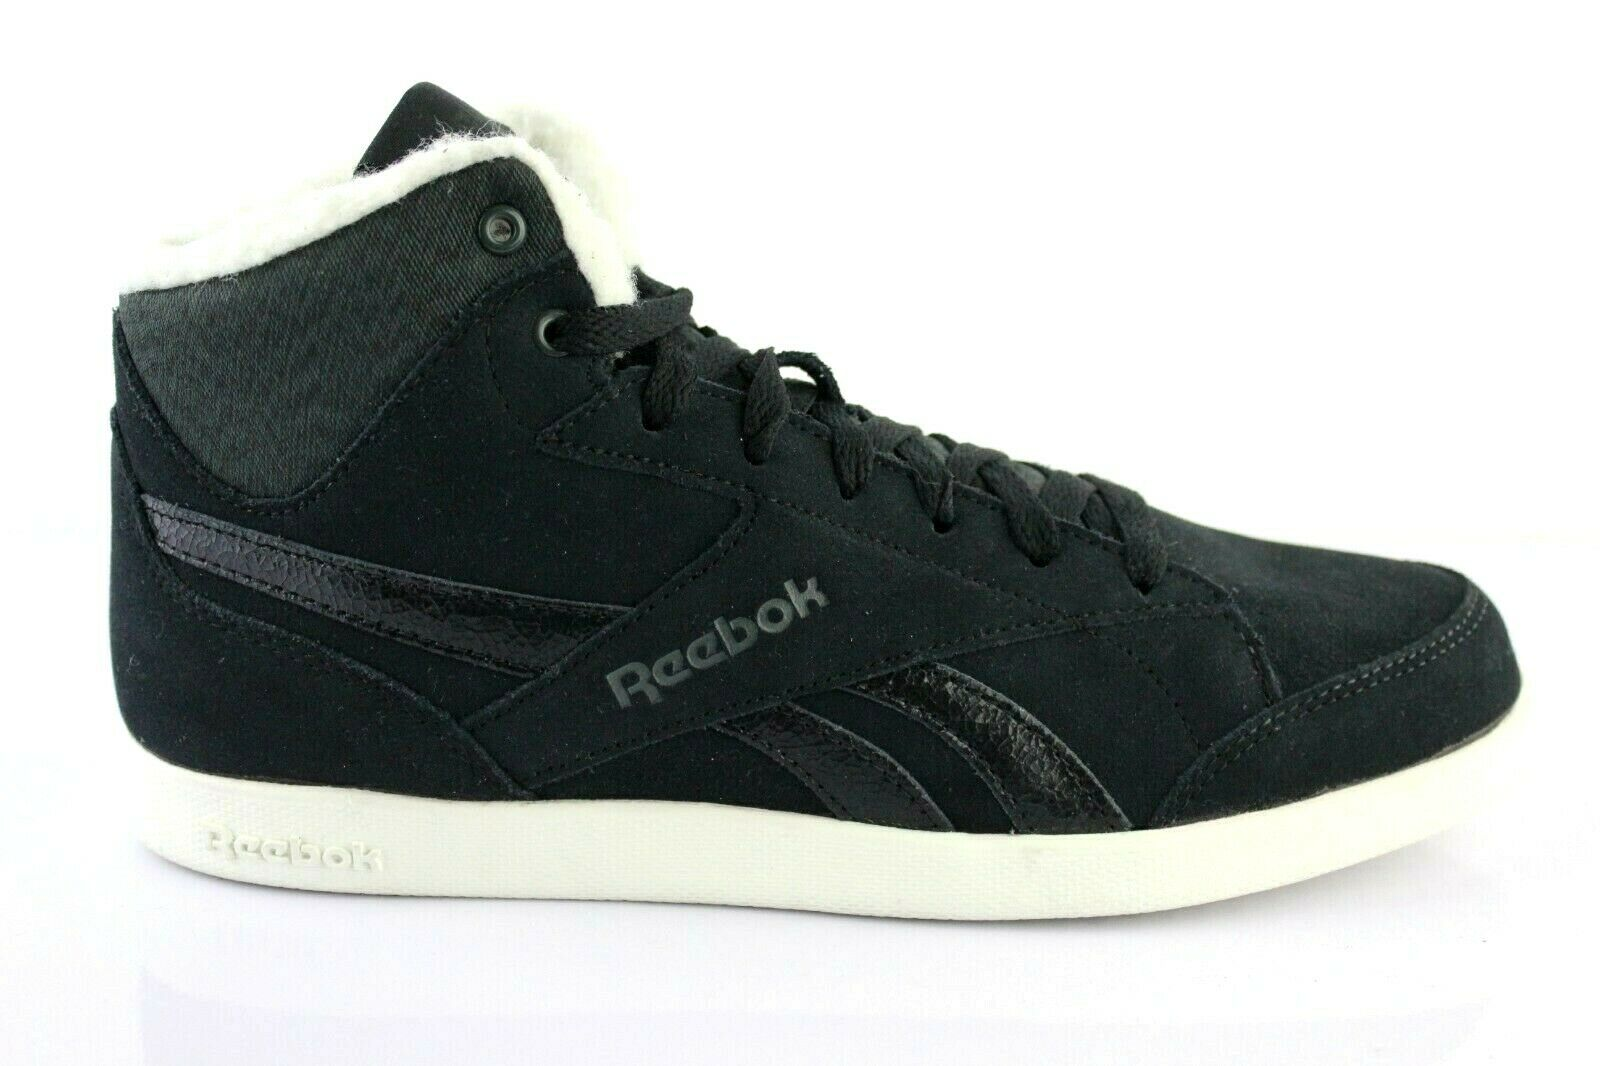 Reebok Fabulista mid Alpine Trainers mid Padded stivali  Low scarpe M49218  lo stile classico